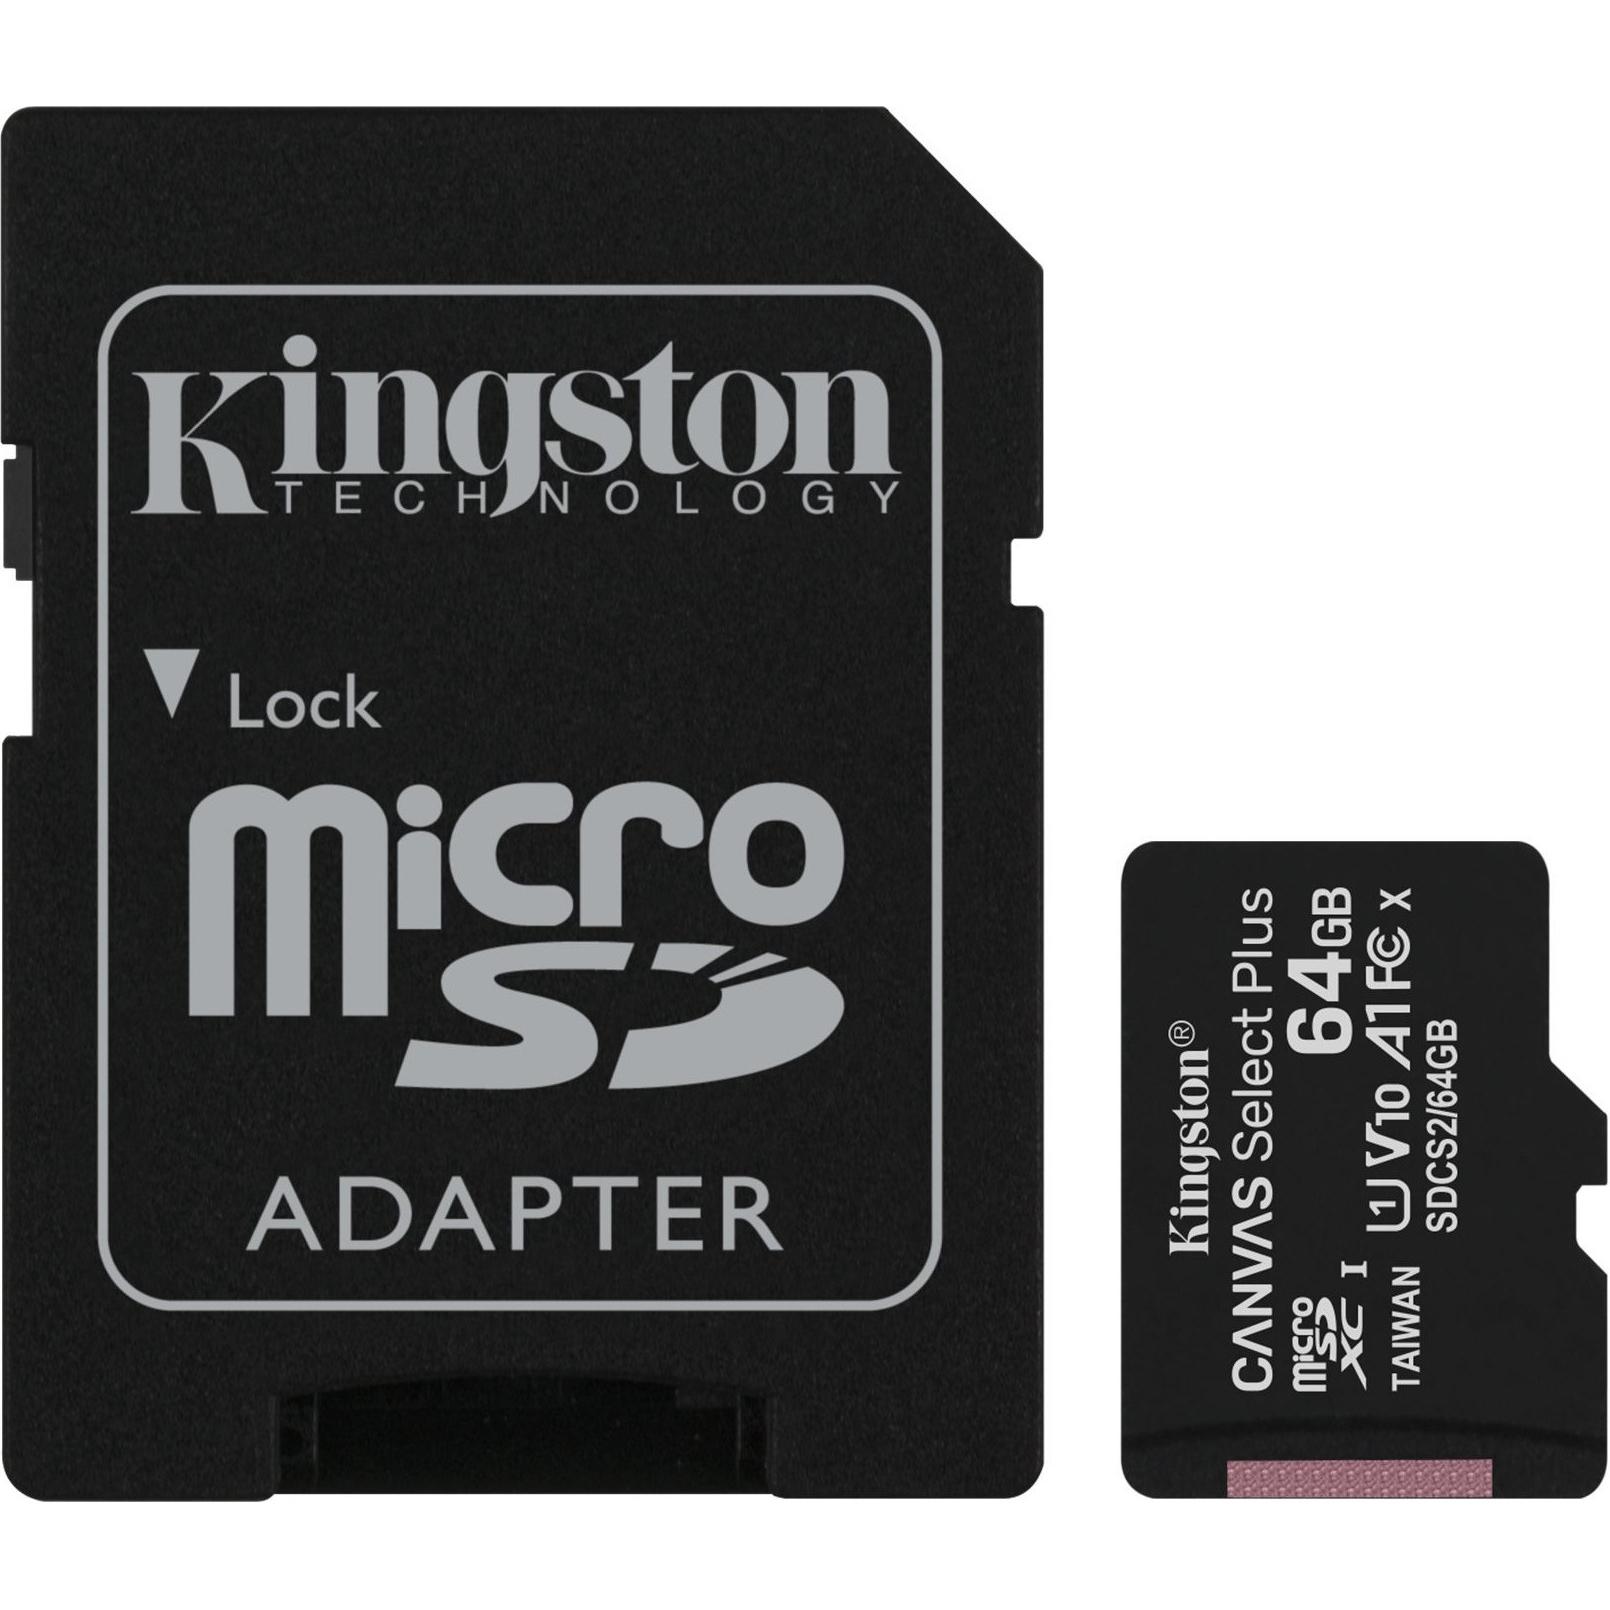 Фото - Карта памяти Kingston Canvas Select Plus microSD 64GB карта памяти kingston canvas select plus microsd 128gb class 10